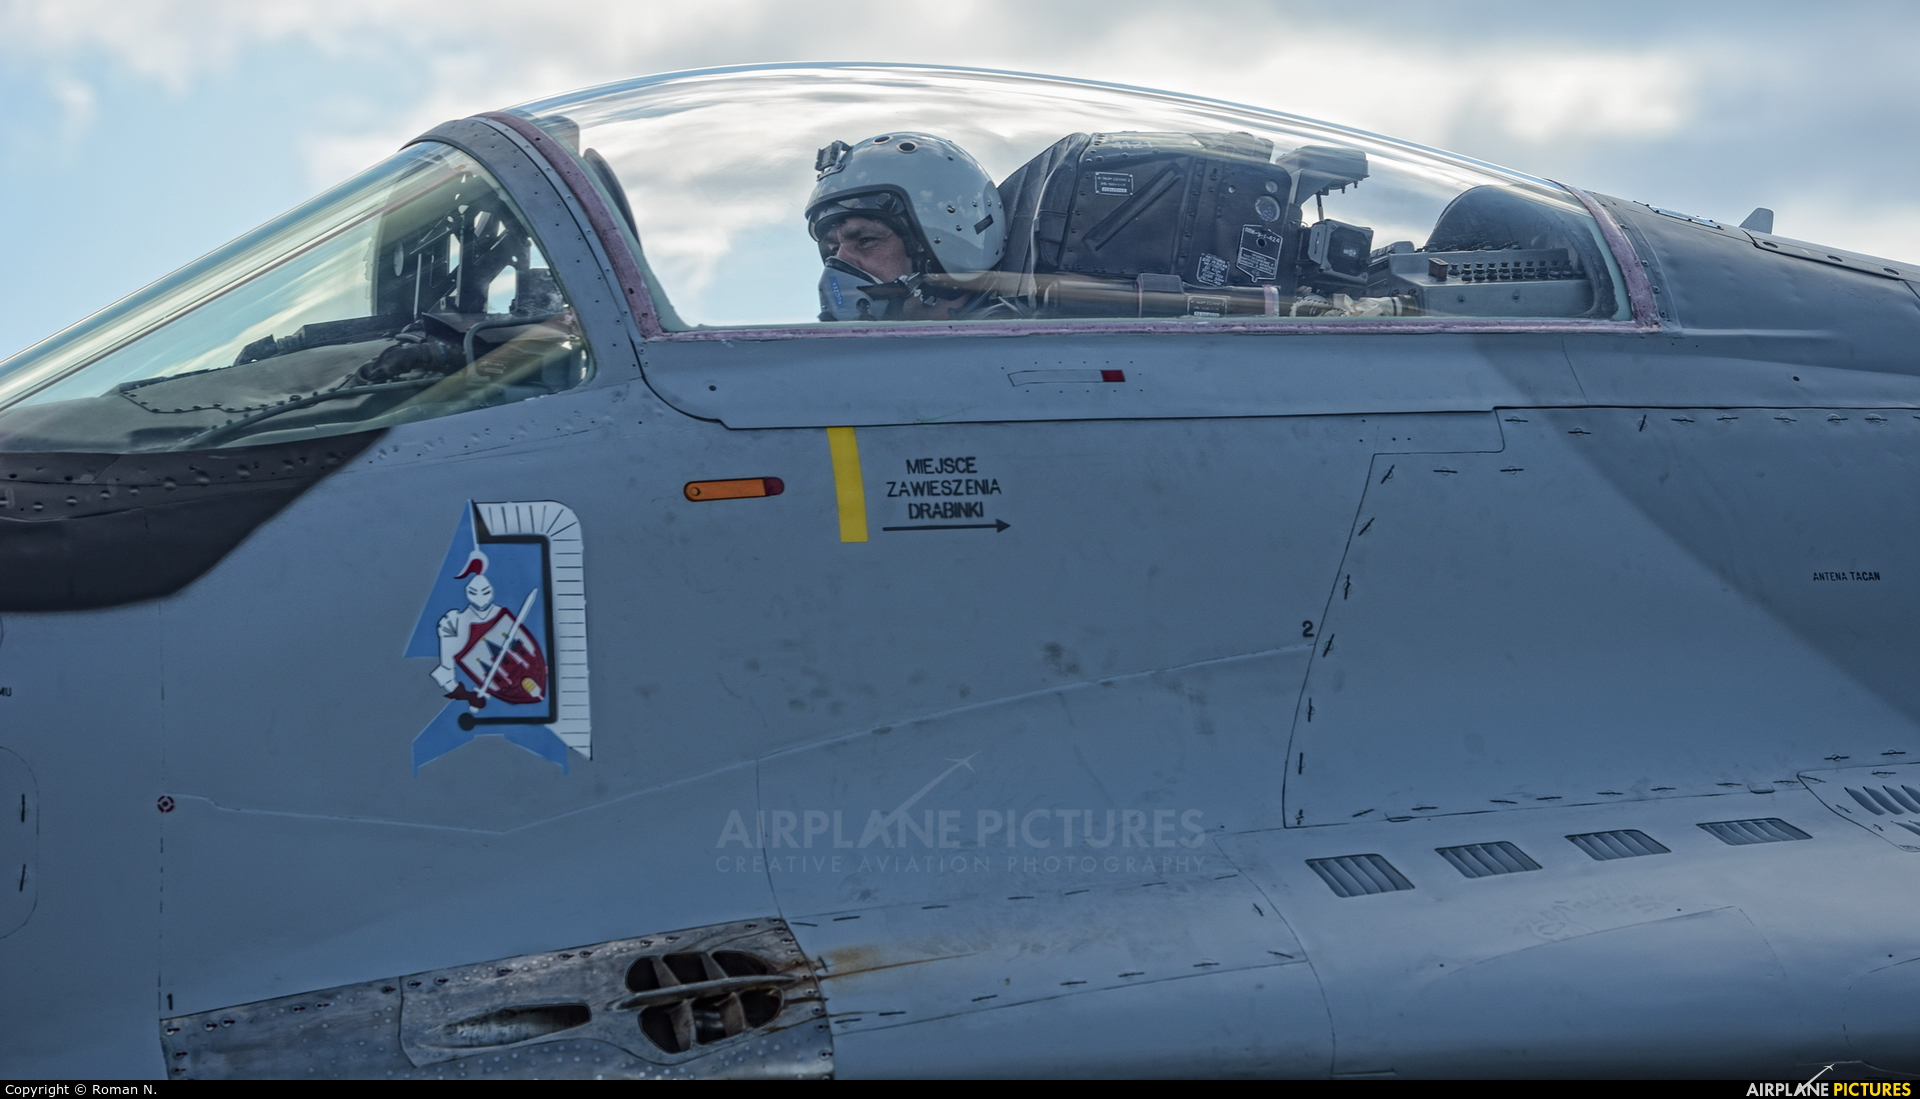 Poland - Air Force 4121 aircraft at Bydgoszcz - Szwederowo